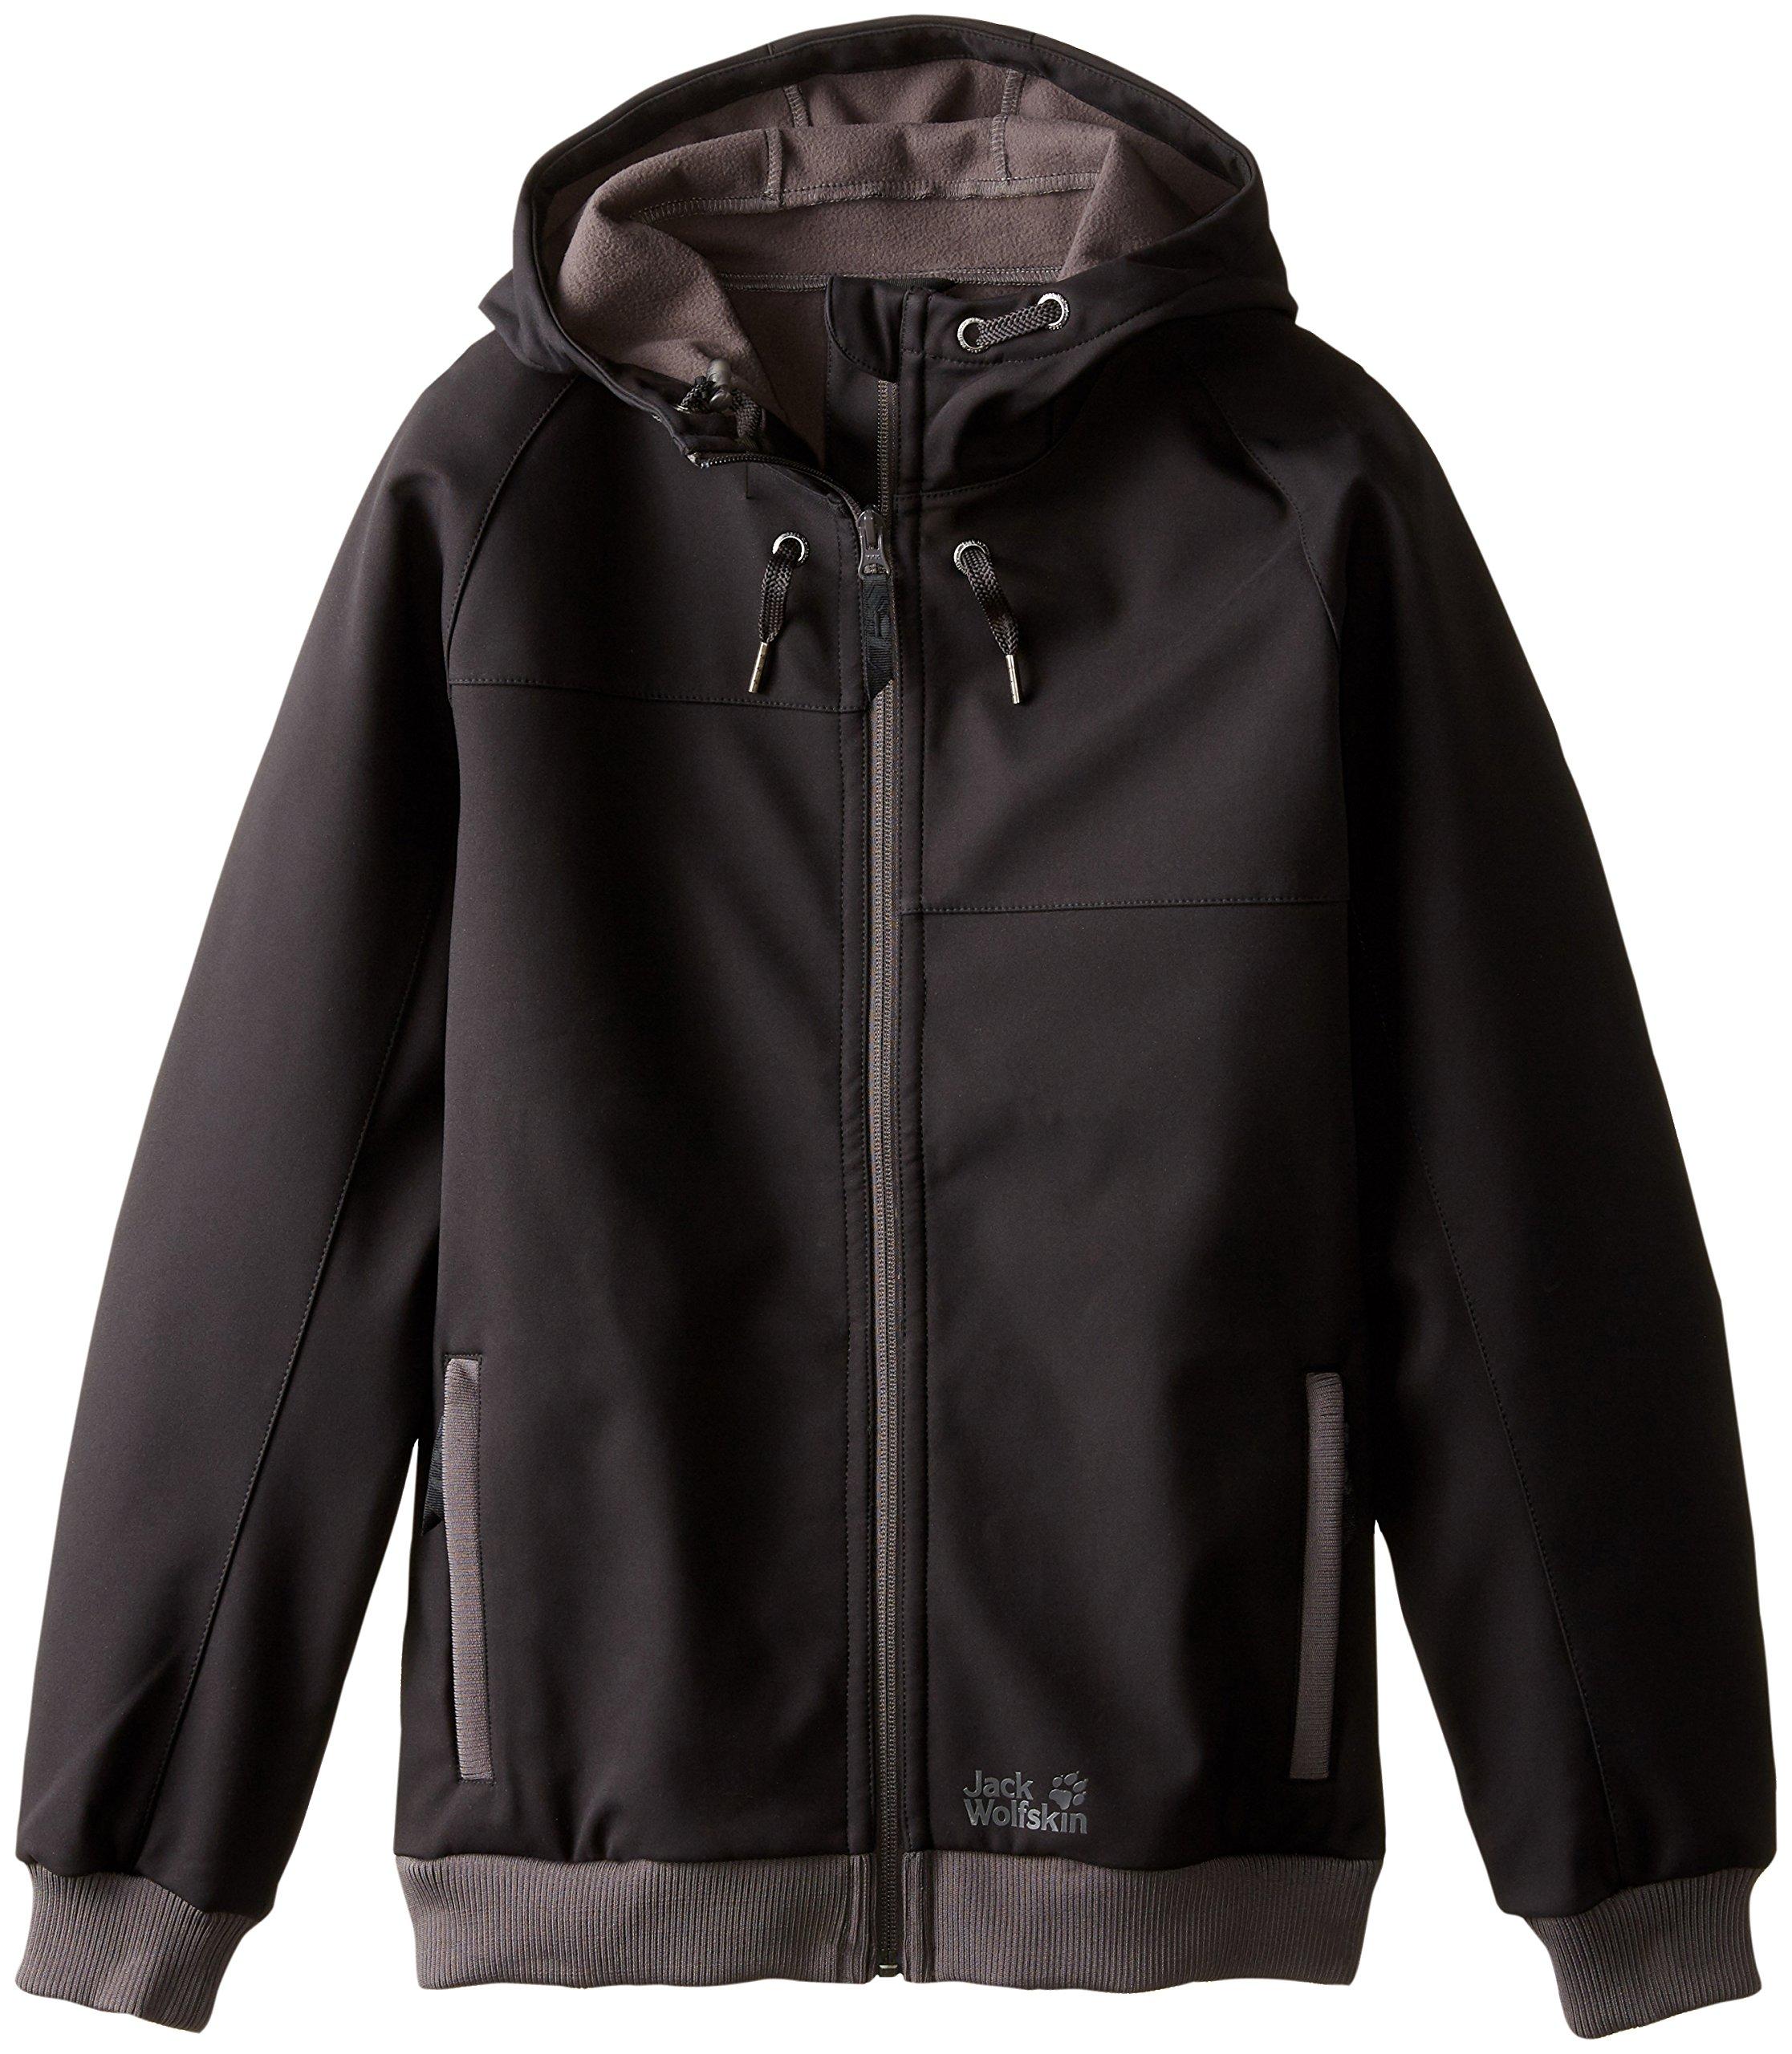 Jack Wolfskin Boy's Stan Soft Shell Jacket, Black, Medium (152/158)